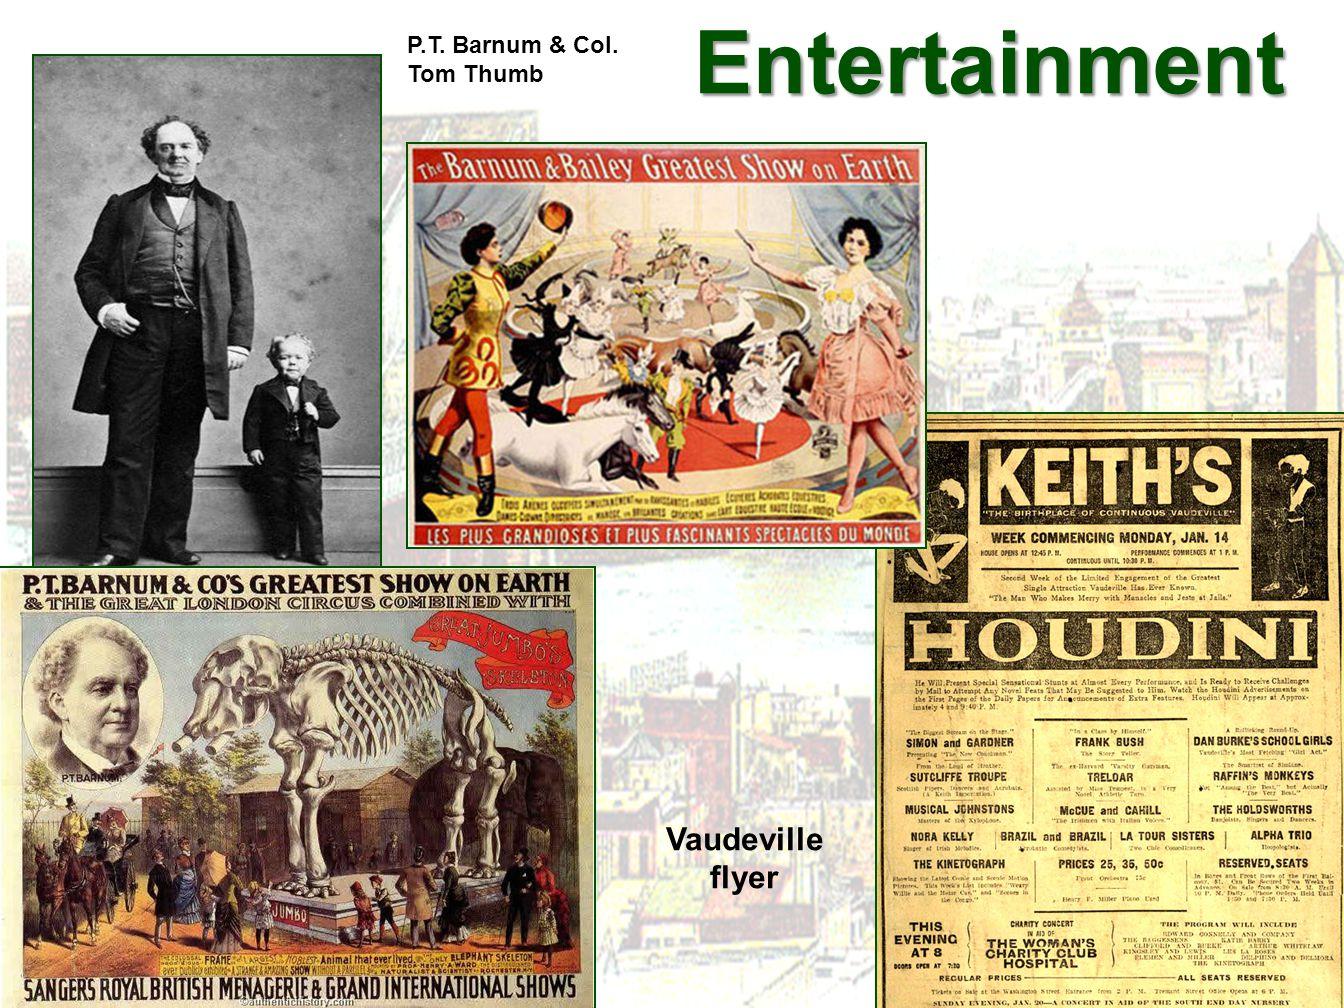 Entertainment Entertainment P.T. Barnum & Col. Tom Thumb Vaudeville flyer